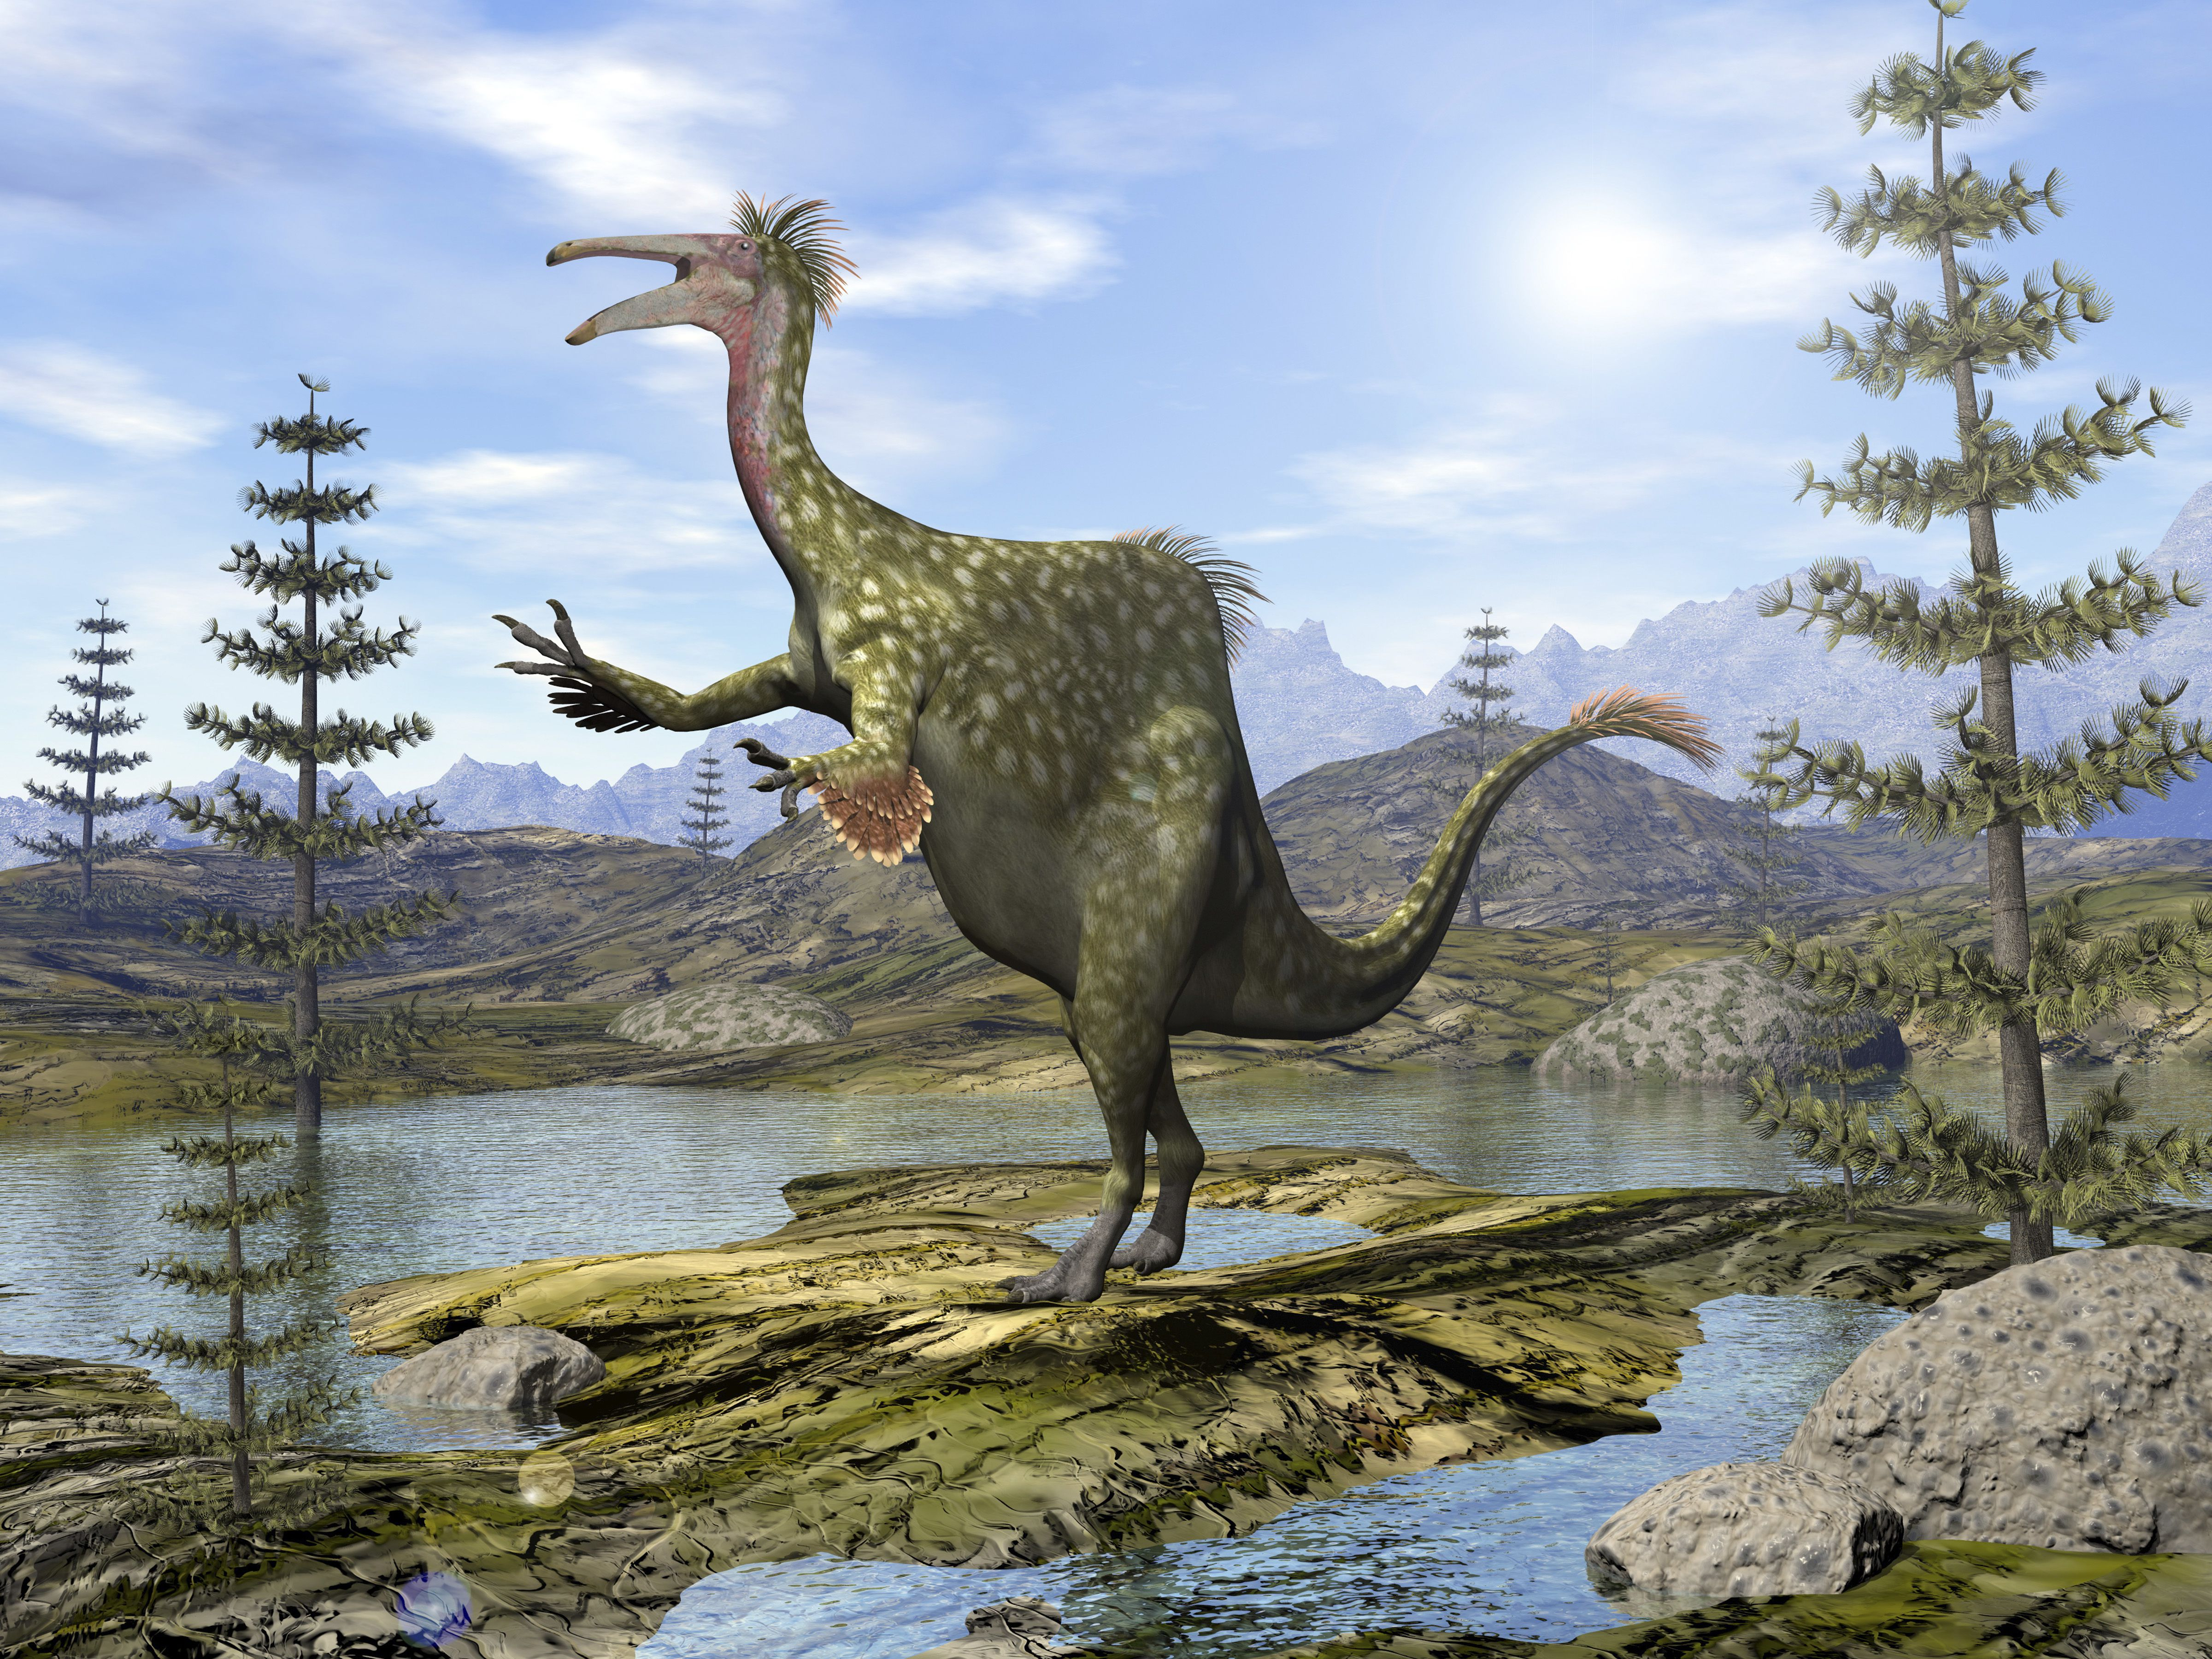 Deinocheirus dinosaur in an enviornment of ponds and calamites.